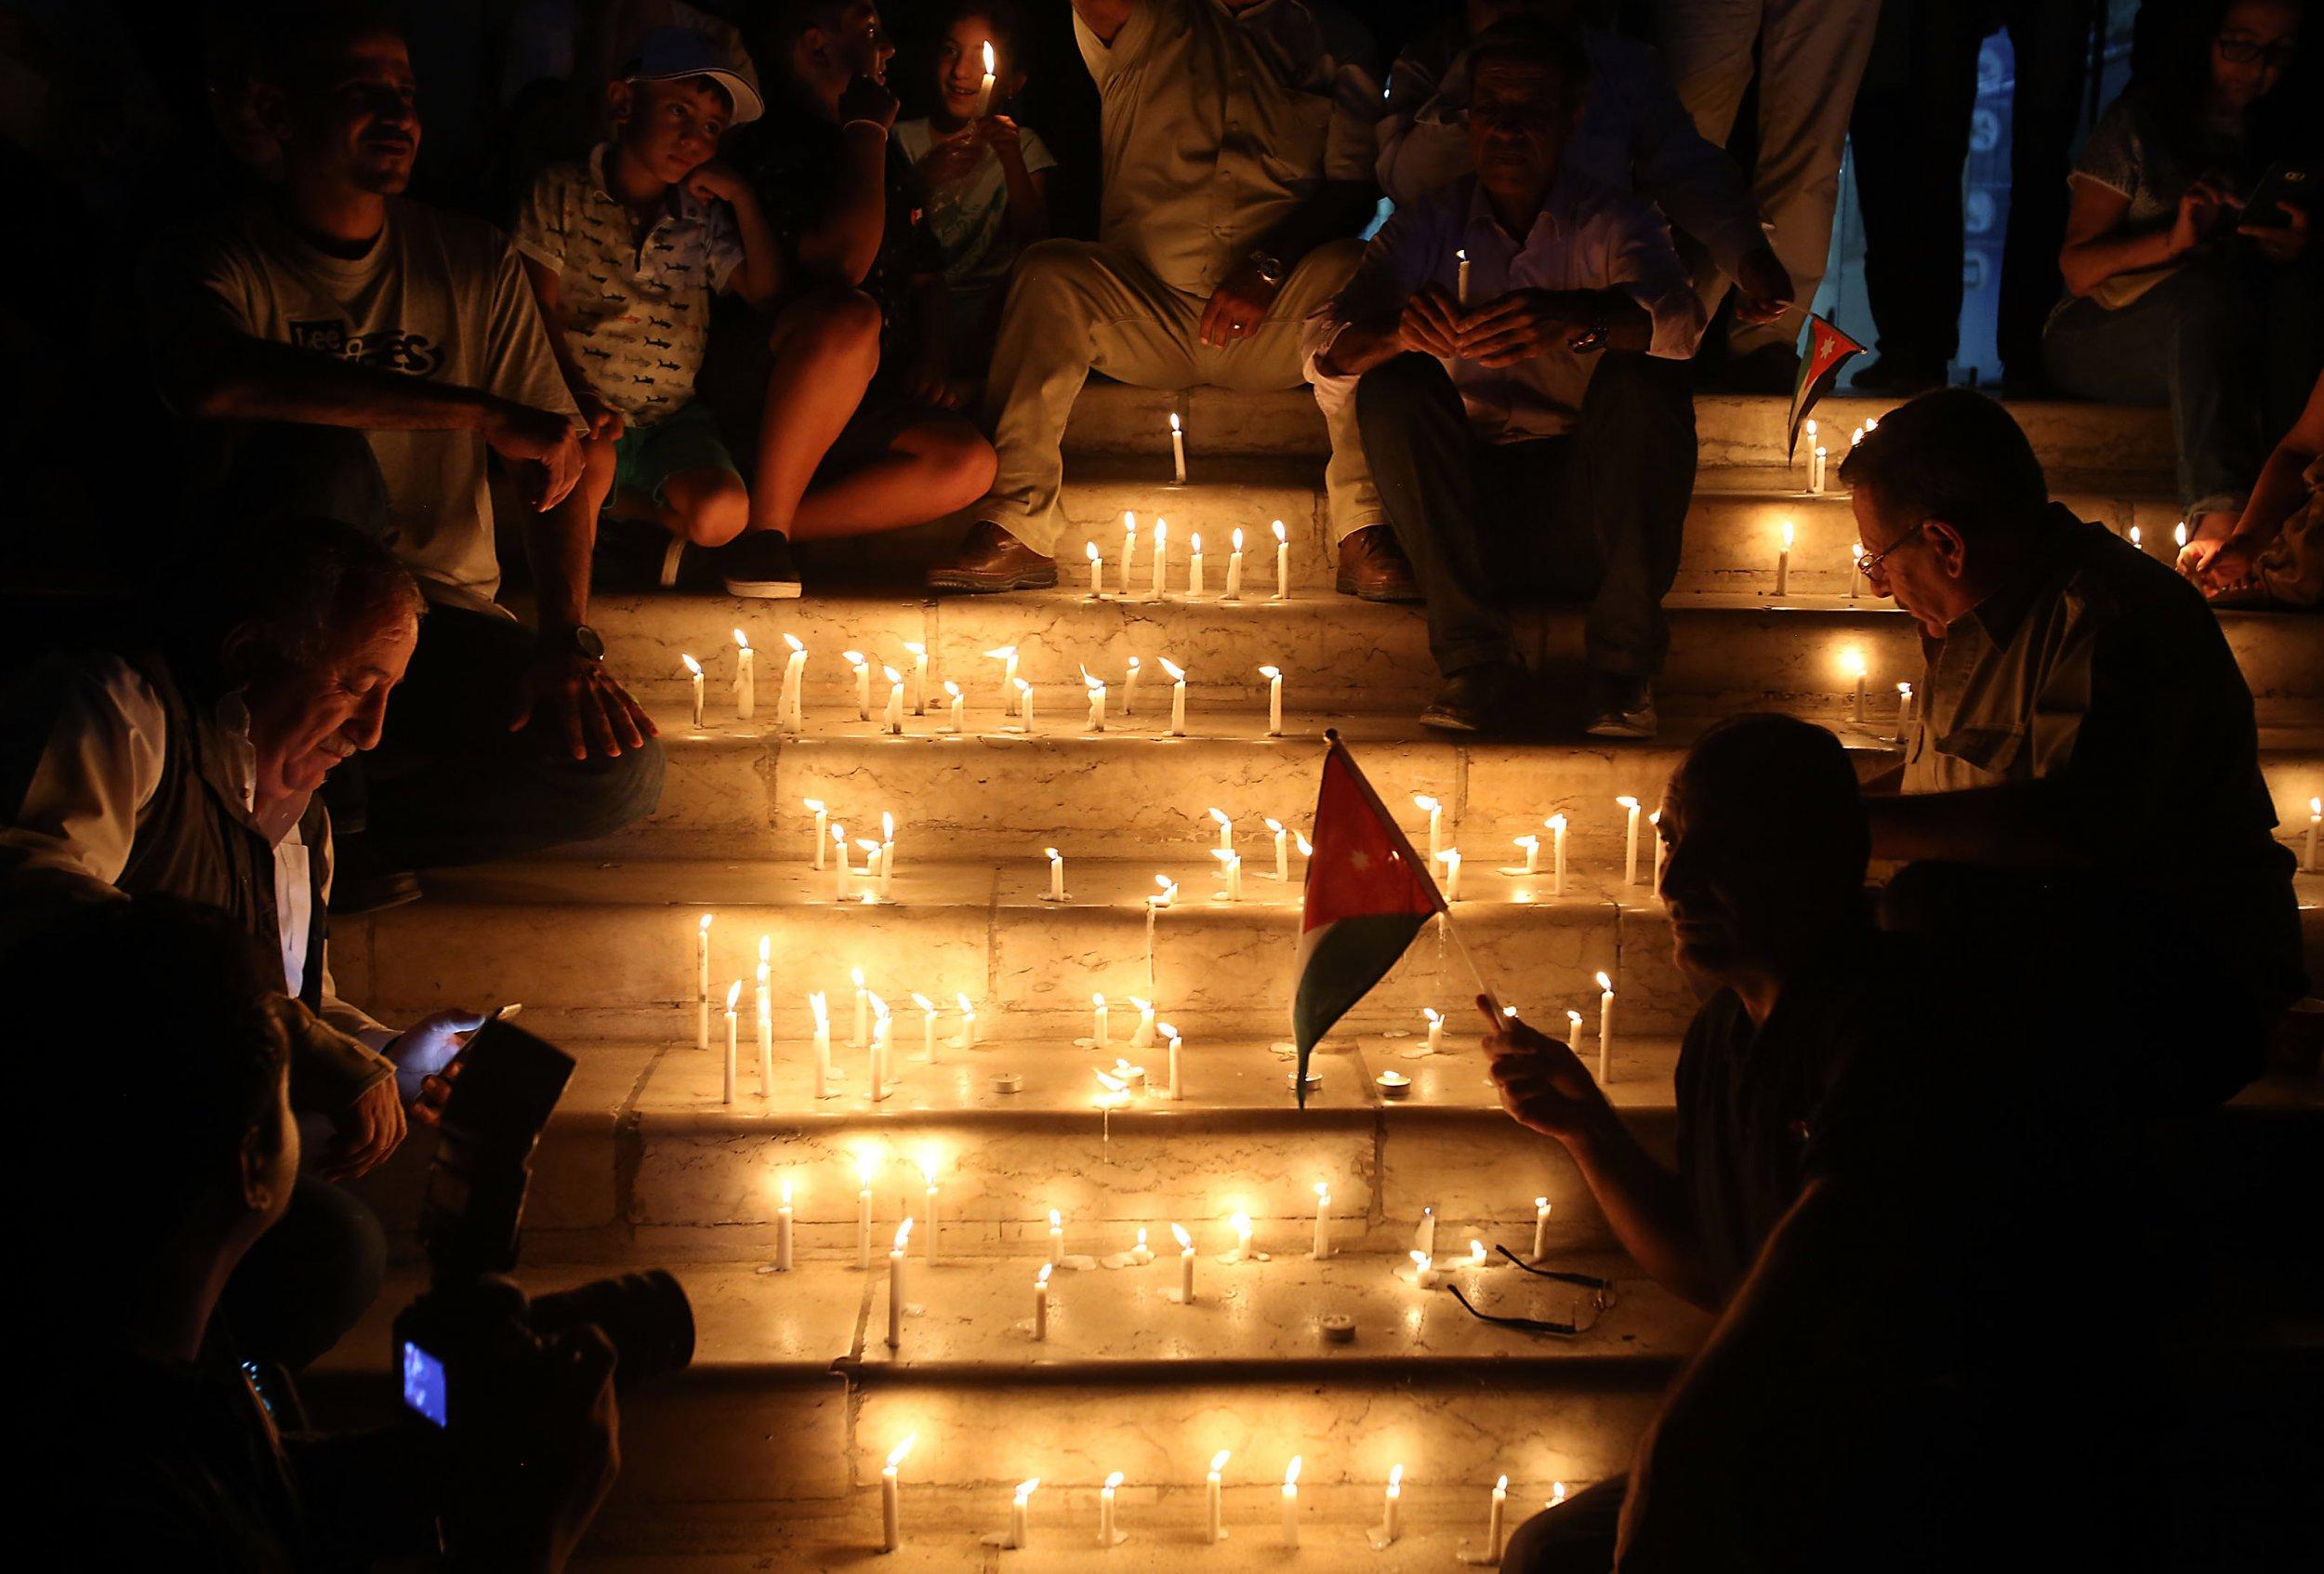 Jordan candlelit vigil